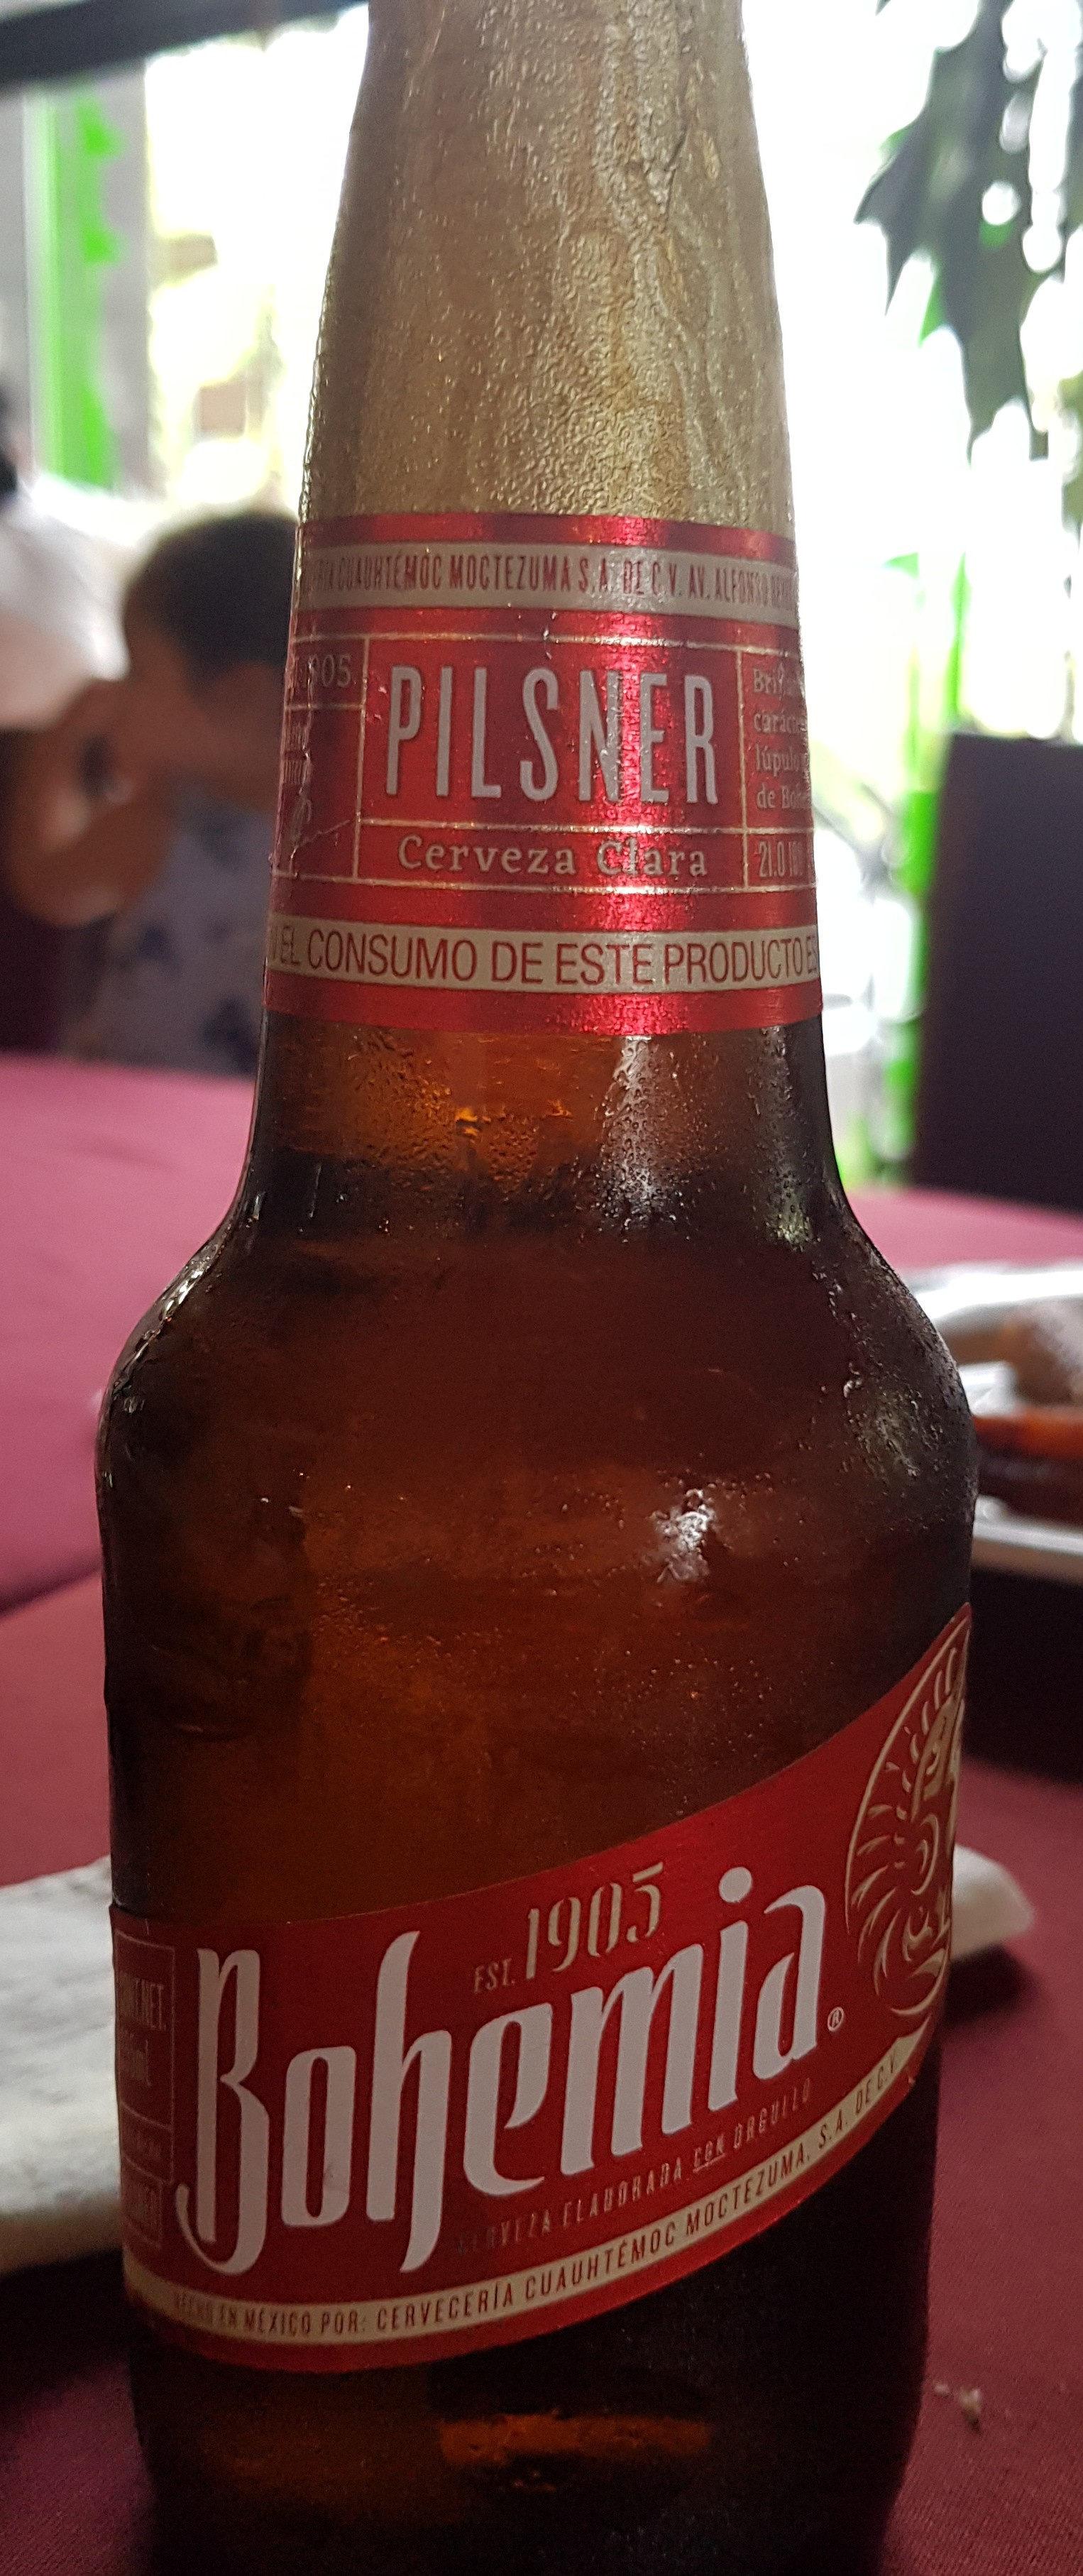 Cerveza Bohemia - Product - es